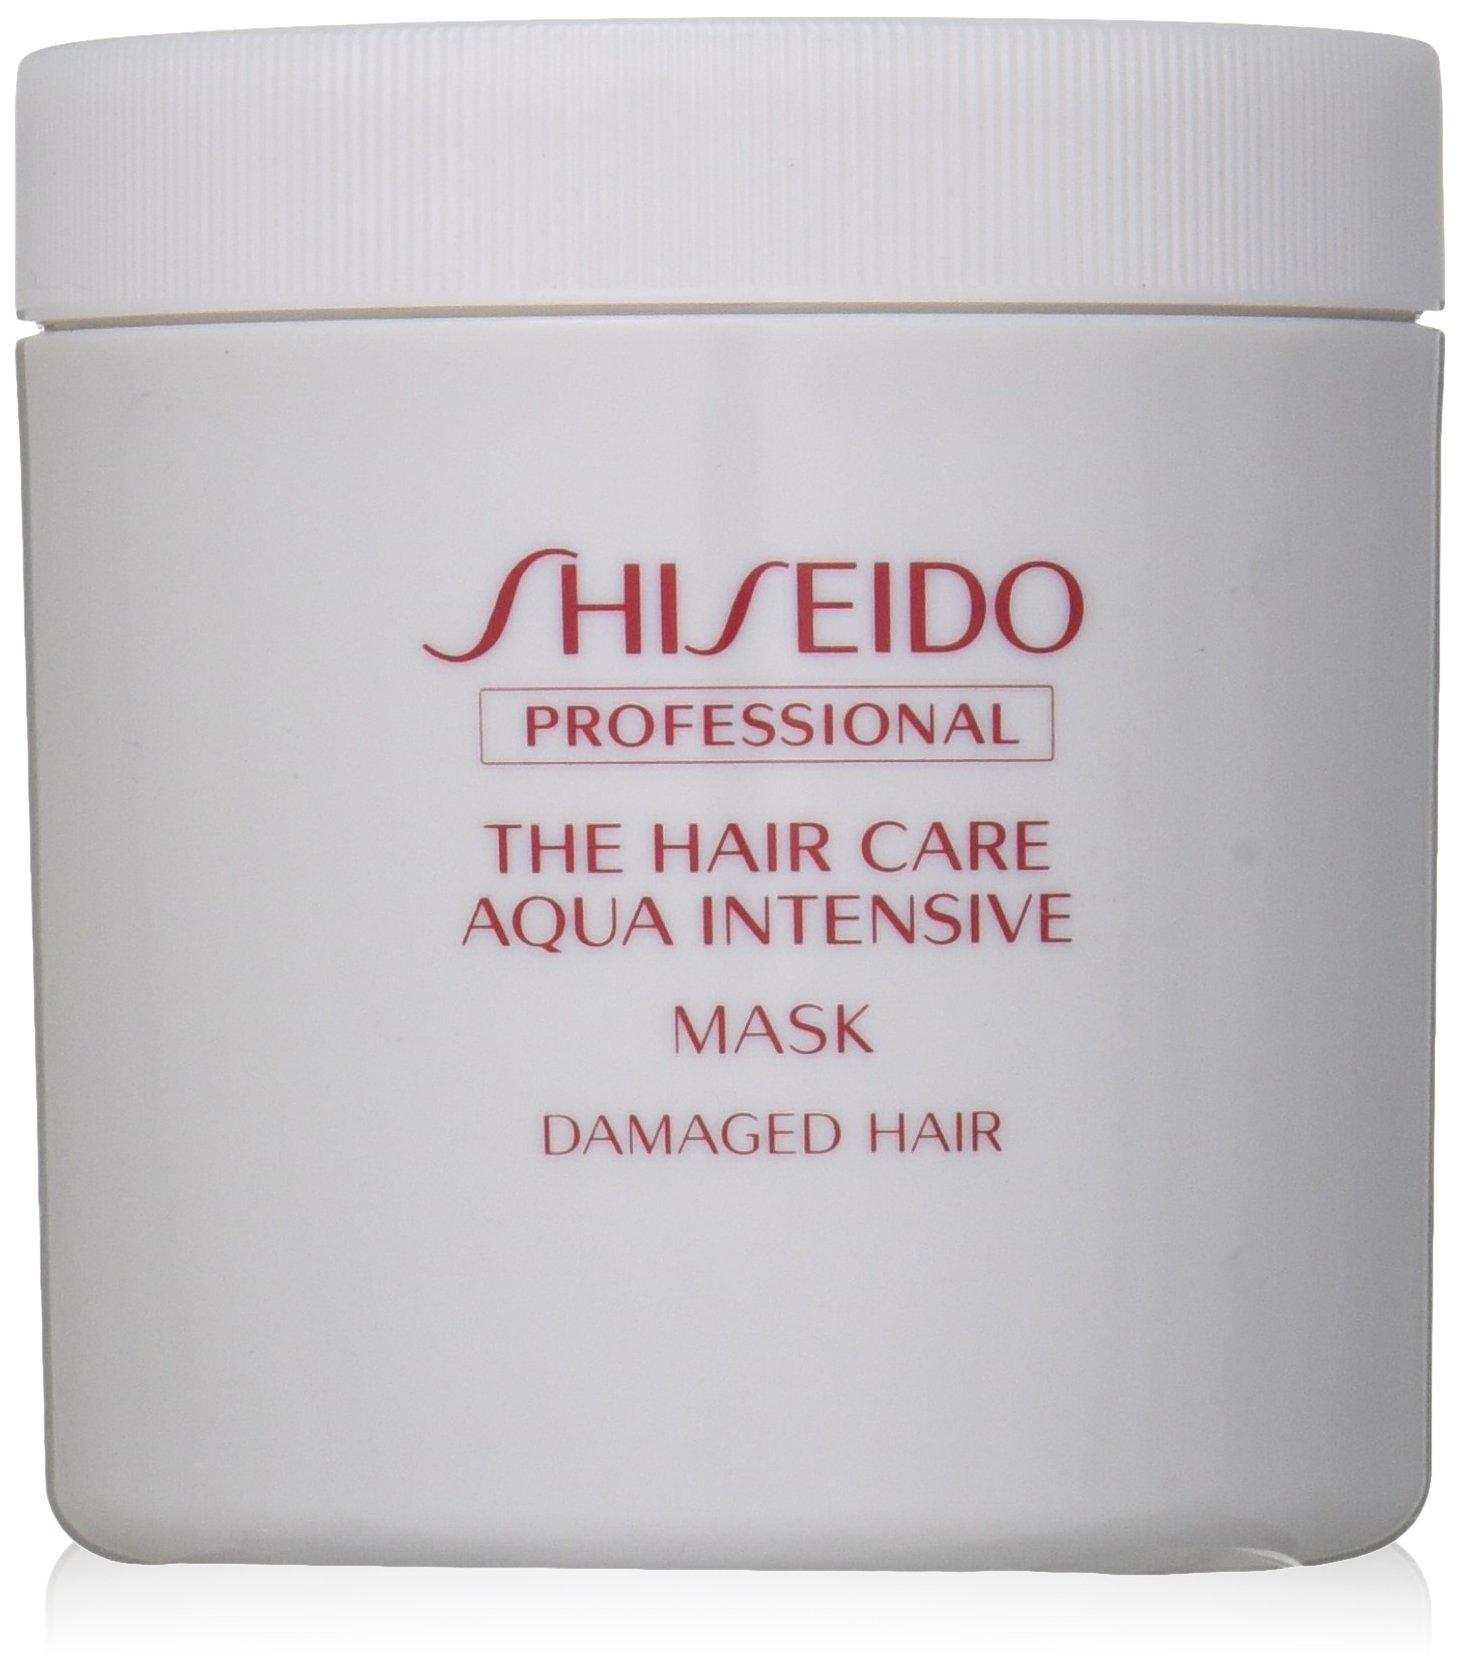 Shiseido The Hair Care Aqua Intensive Mask (Damaged Hair) 680g/23oz